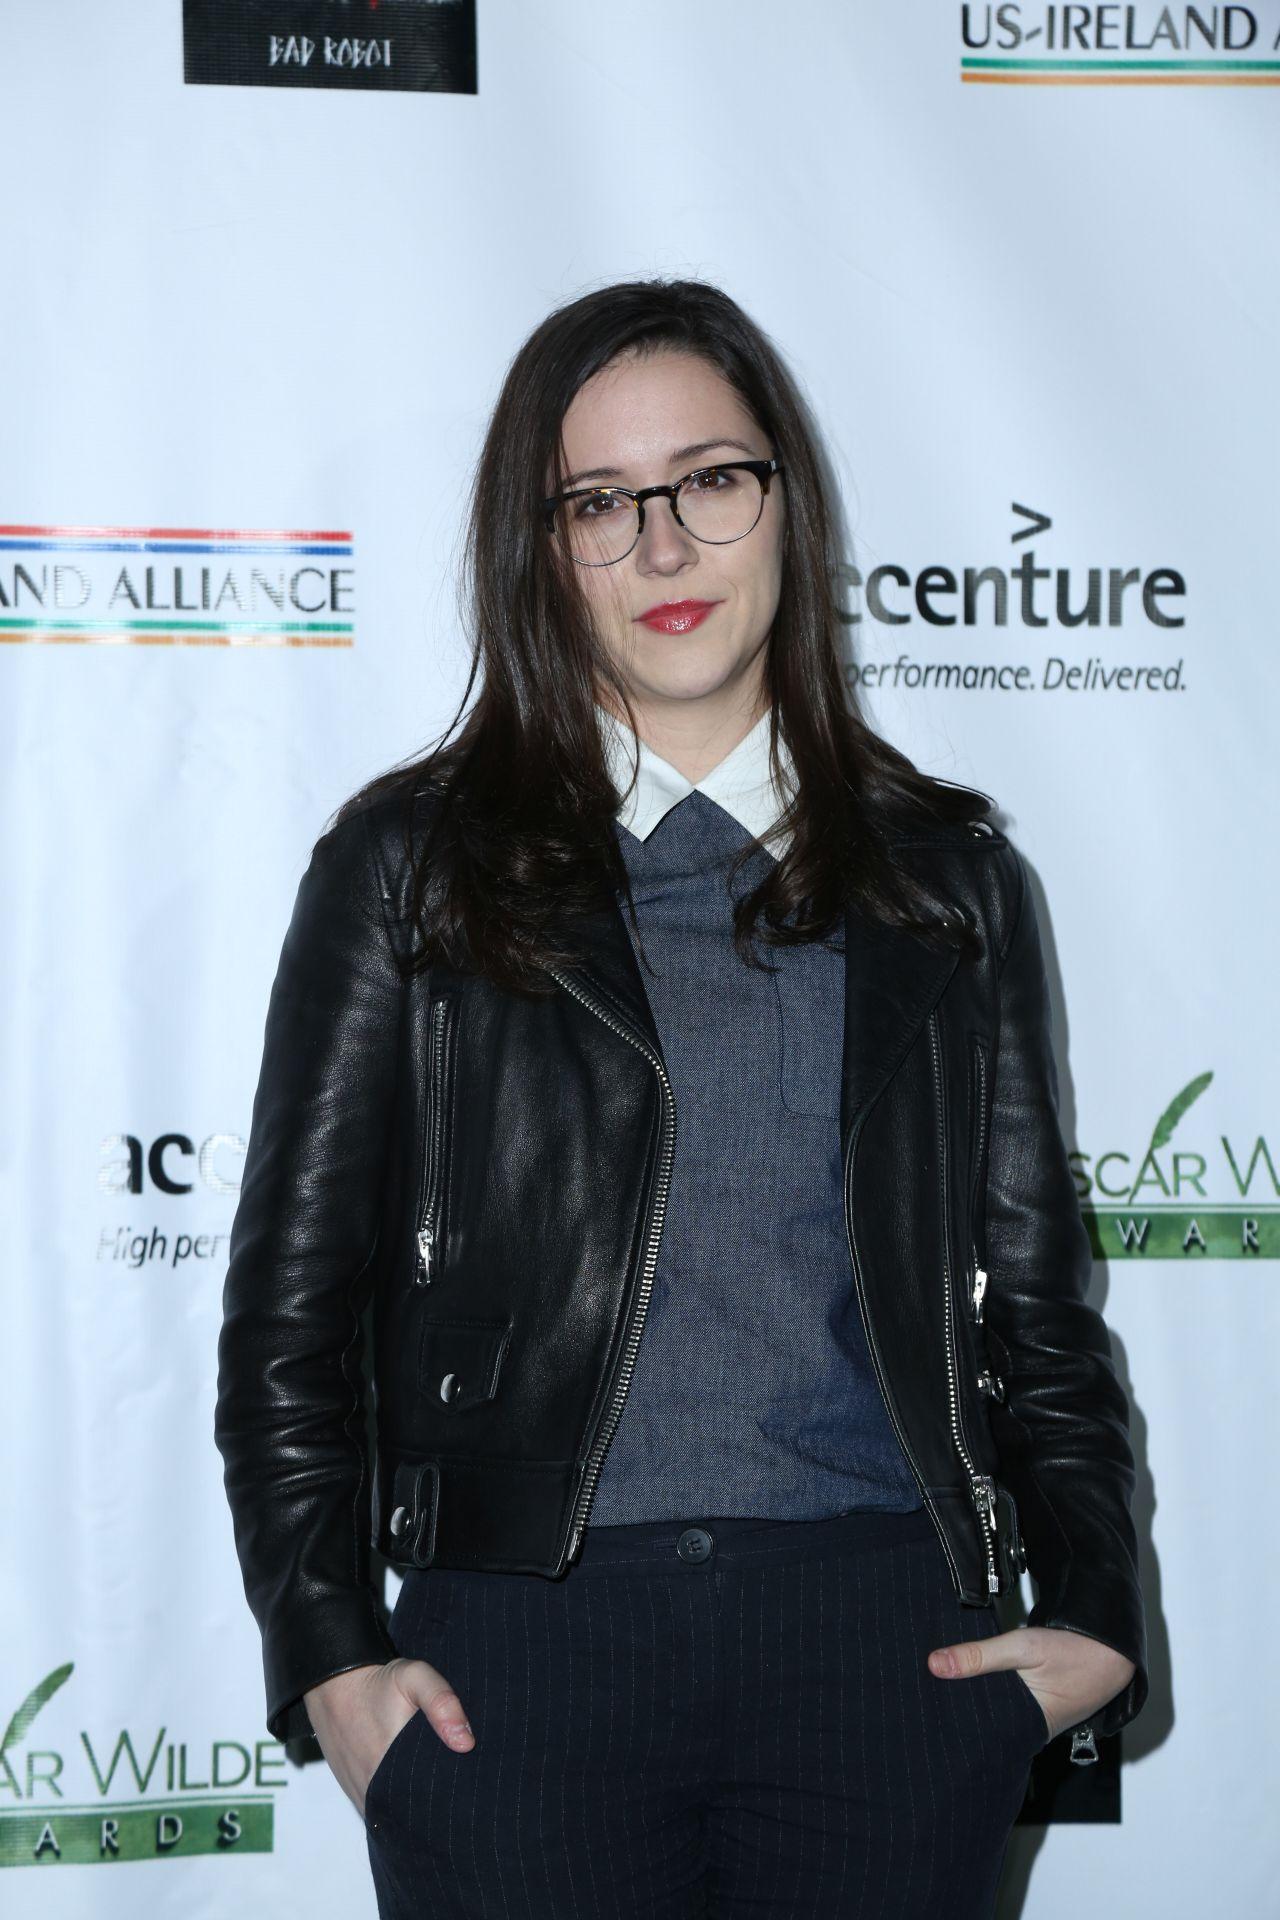 Shannon Woodward Oscar Wilde Awards In Santa Monica 2 23